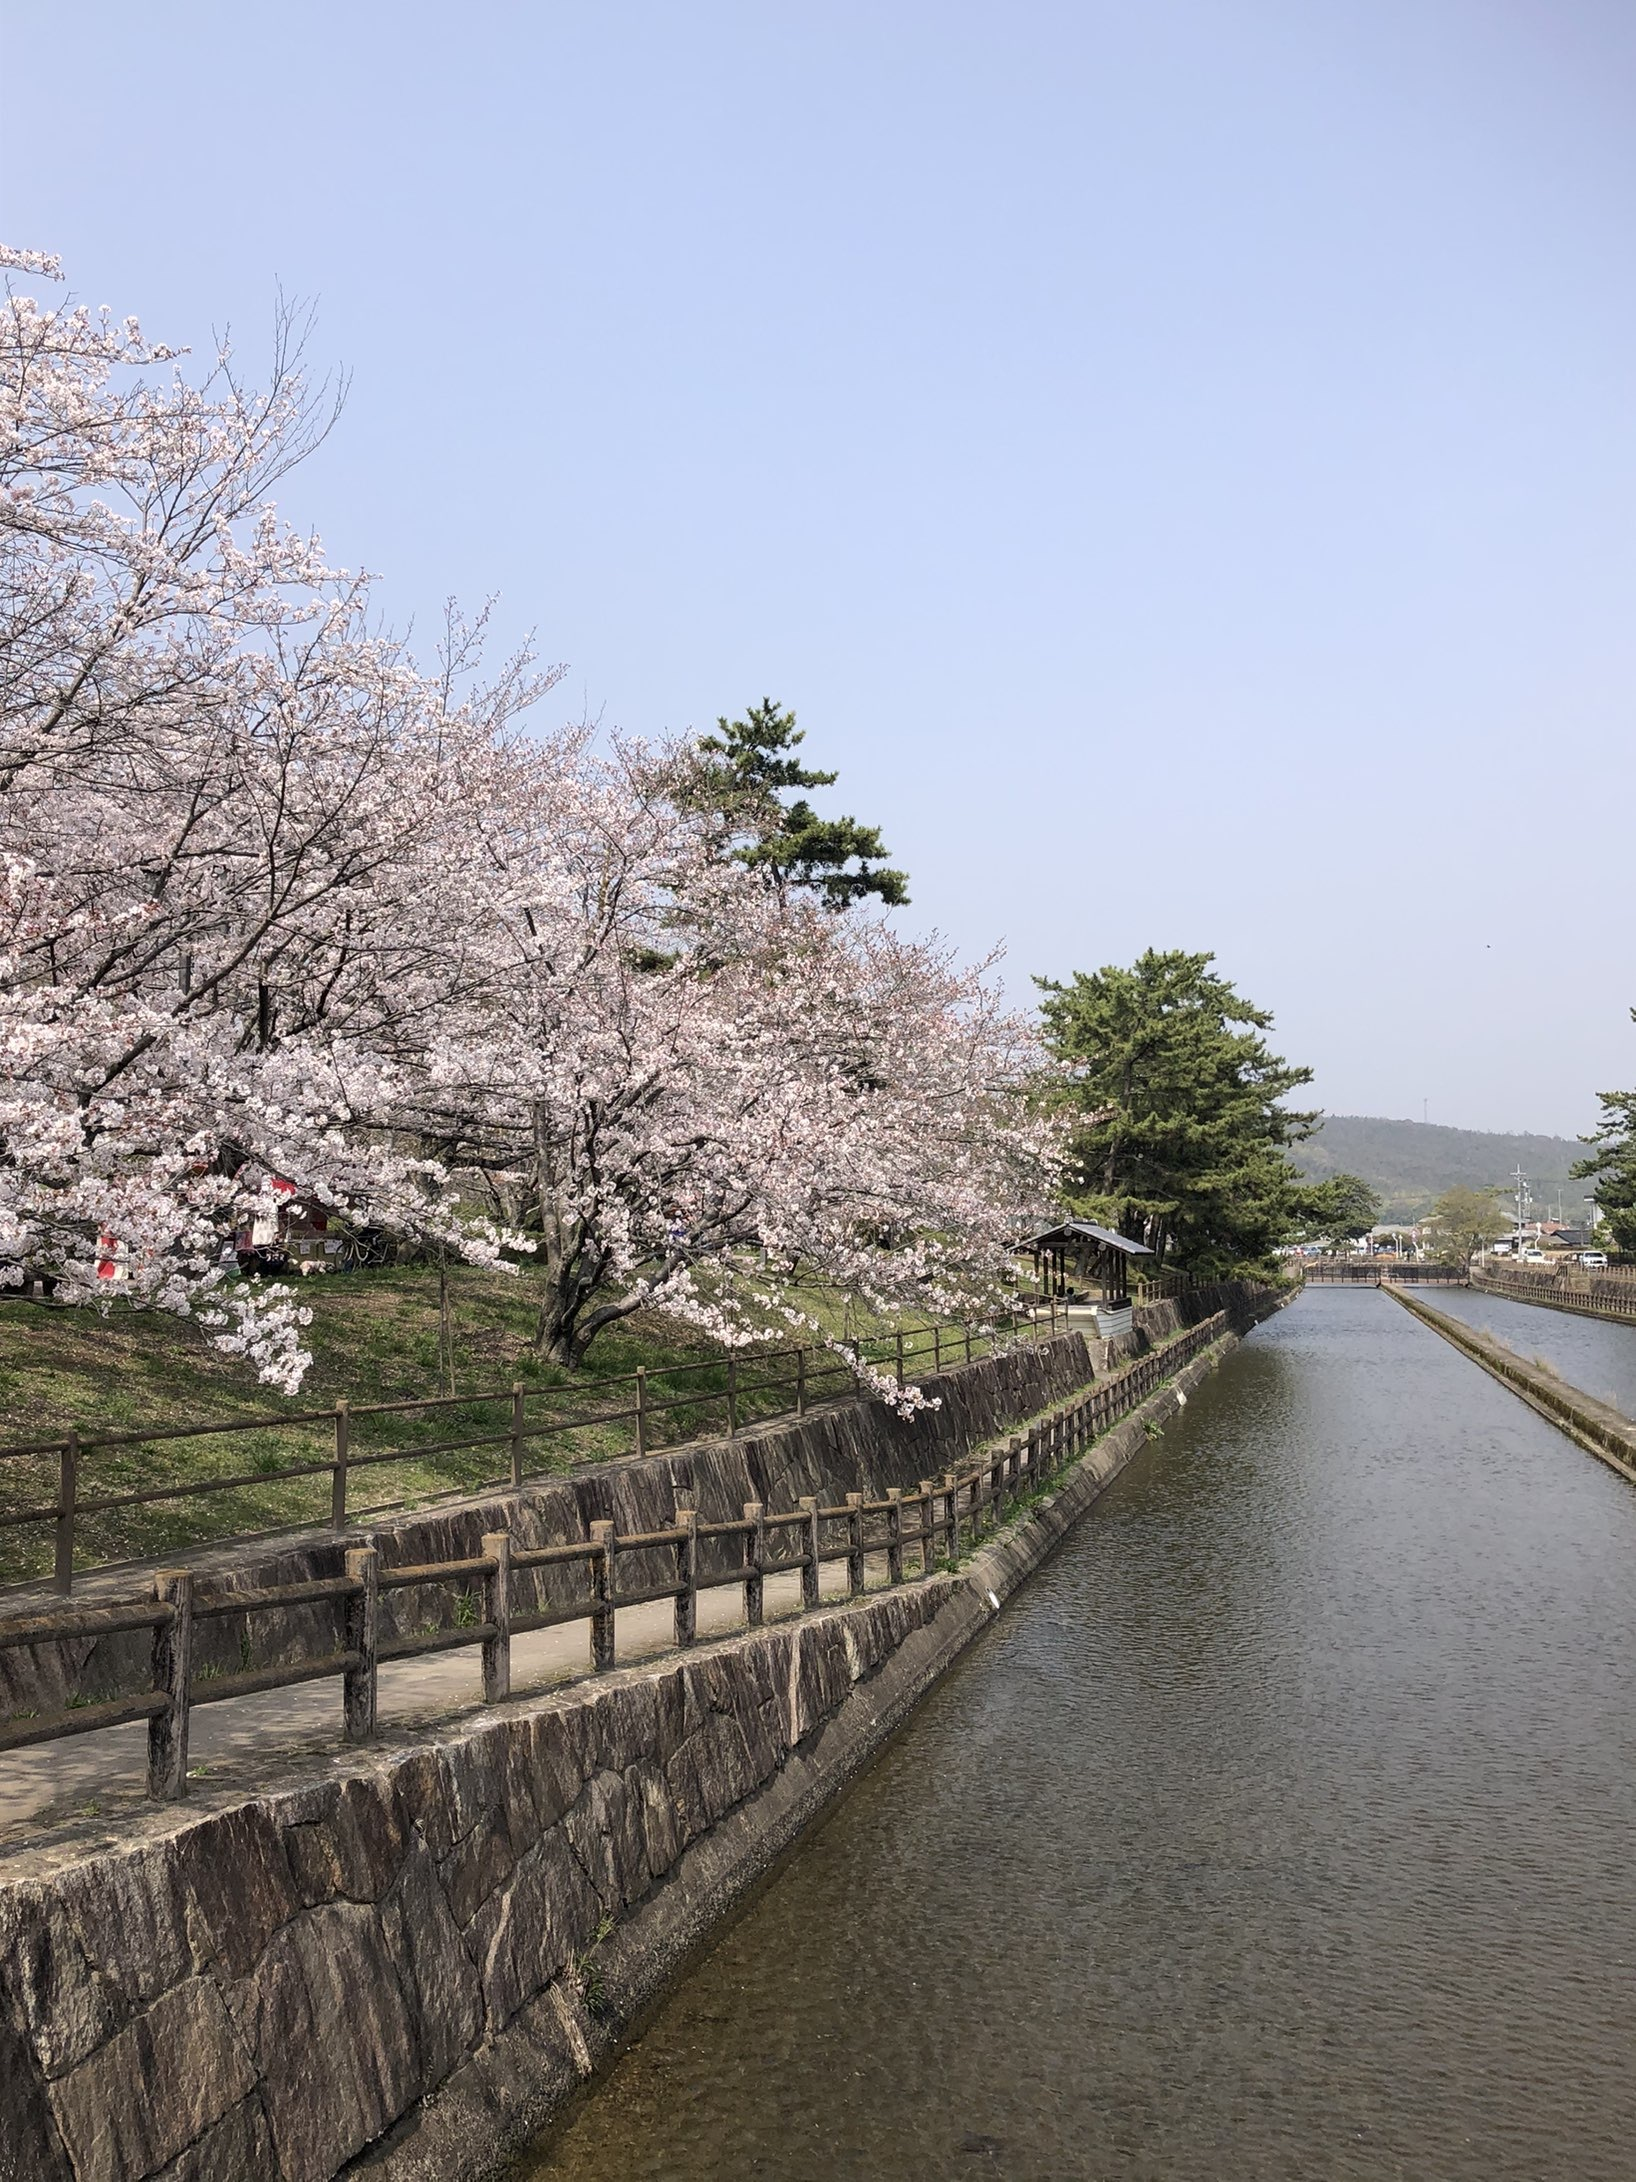 酒津公園用水路沿いの桜